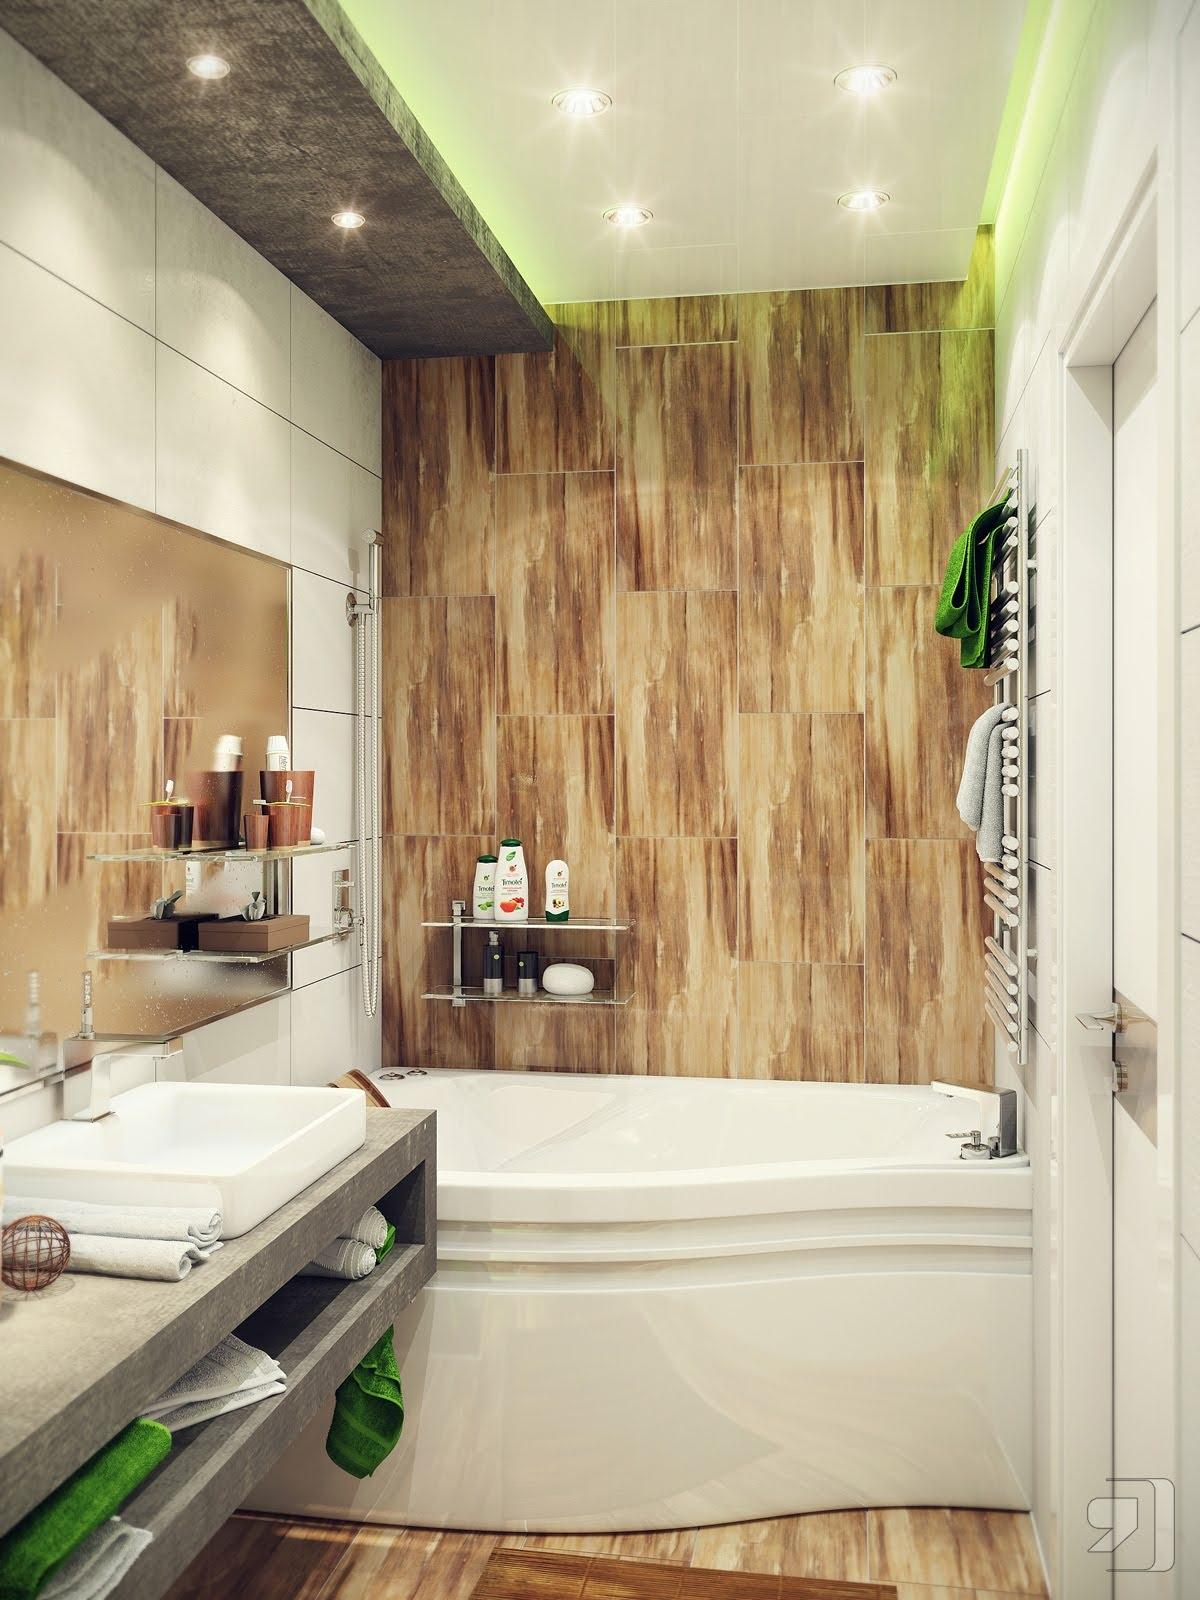 Wooden Wall Interior Bathroom Model